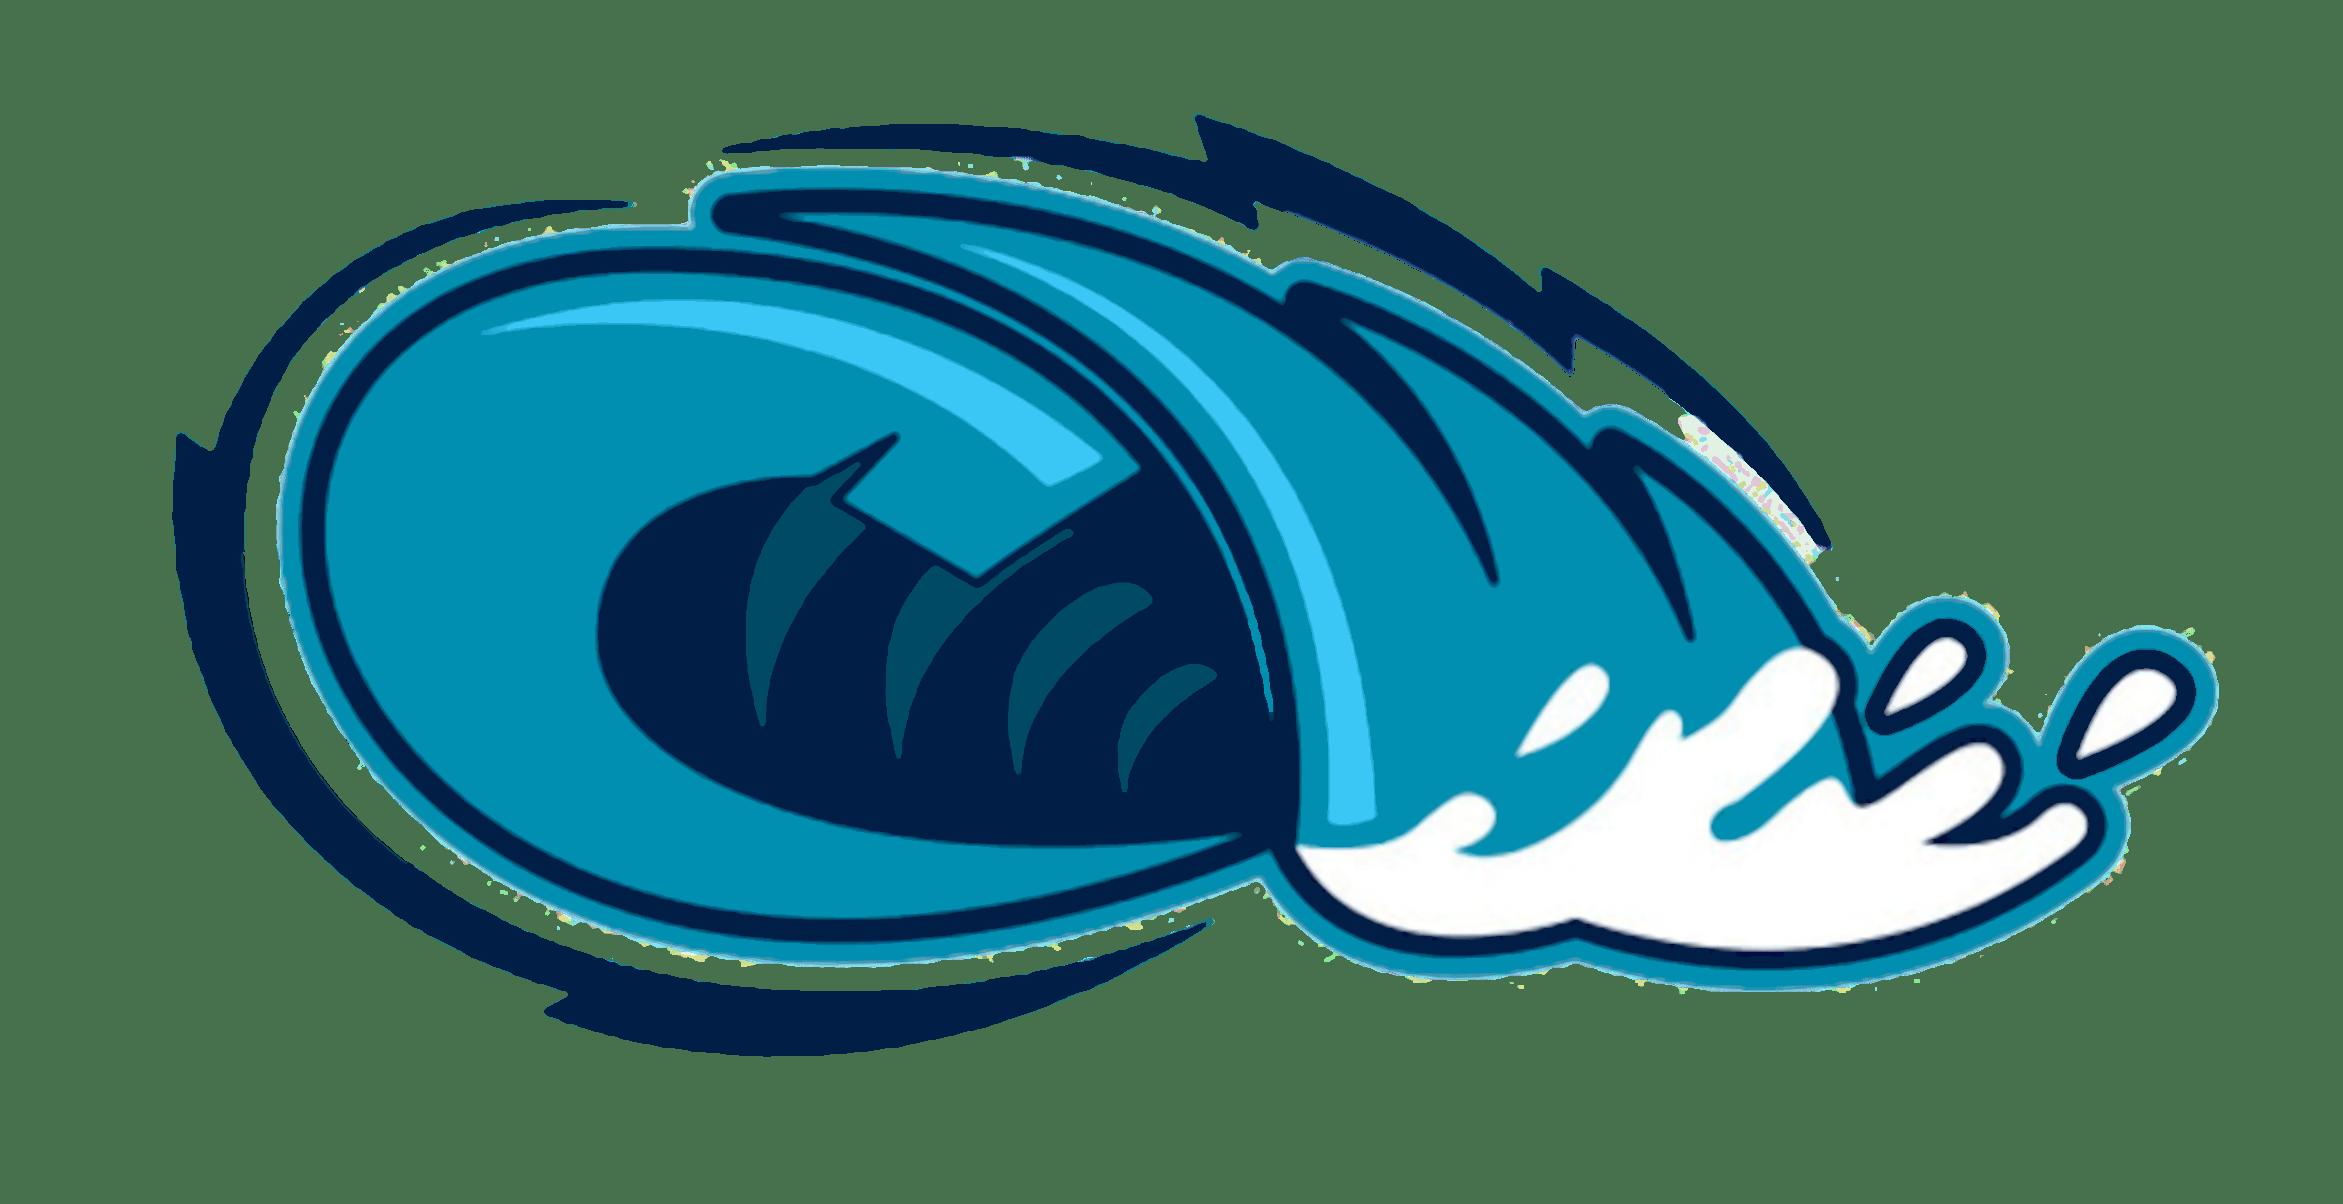 Waves clipart sea wave. Sticker transparent png stickpng